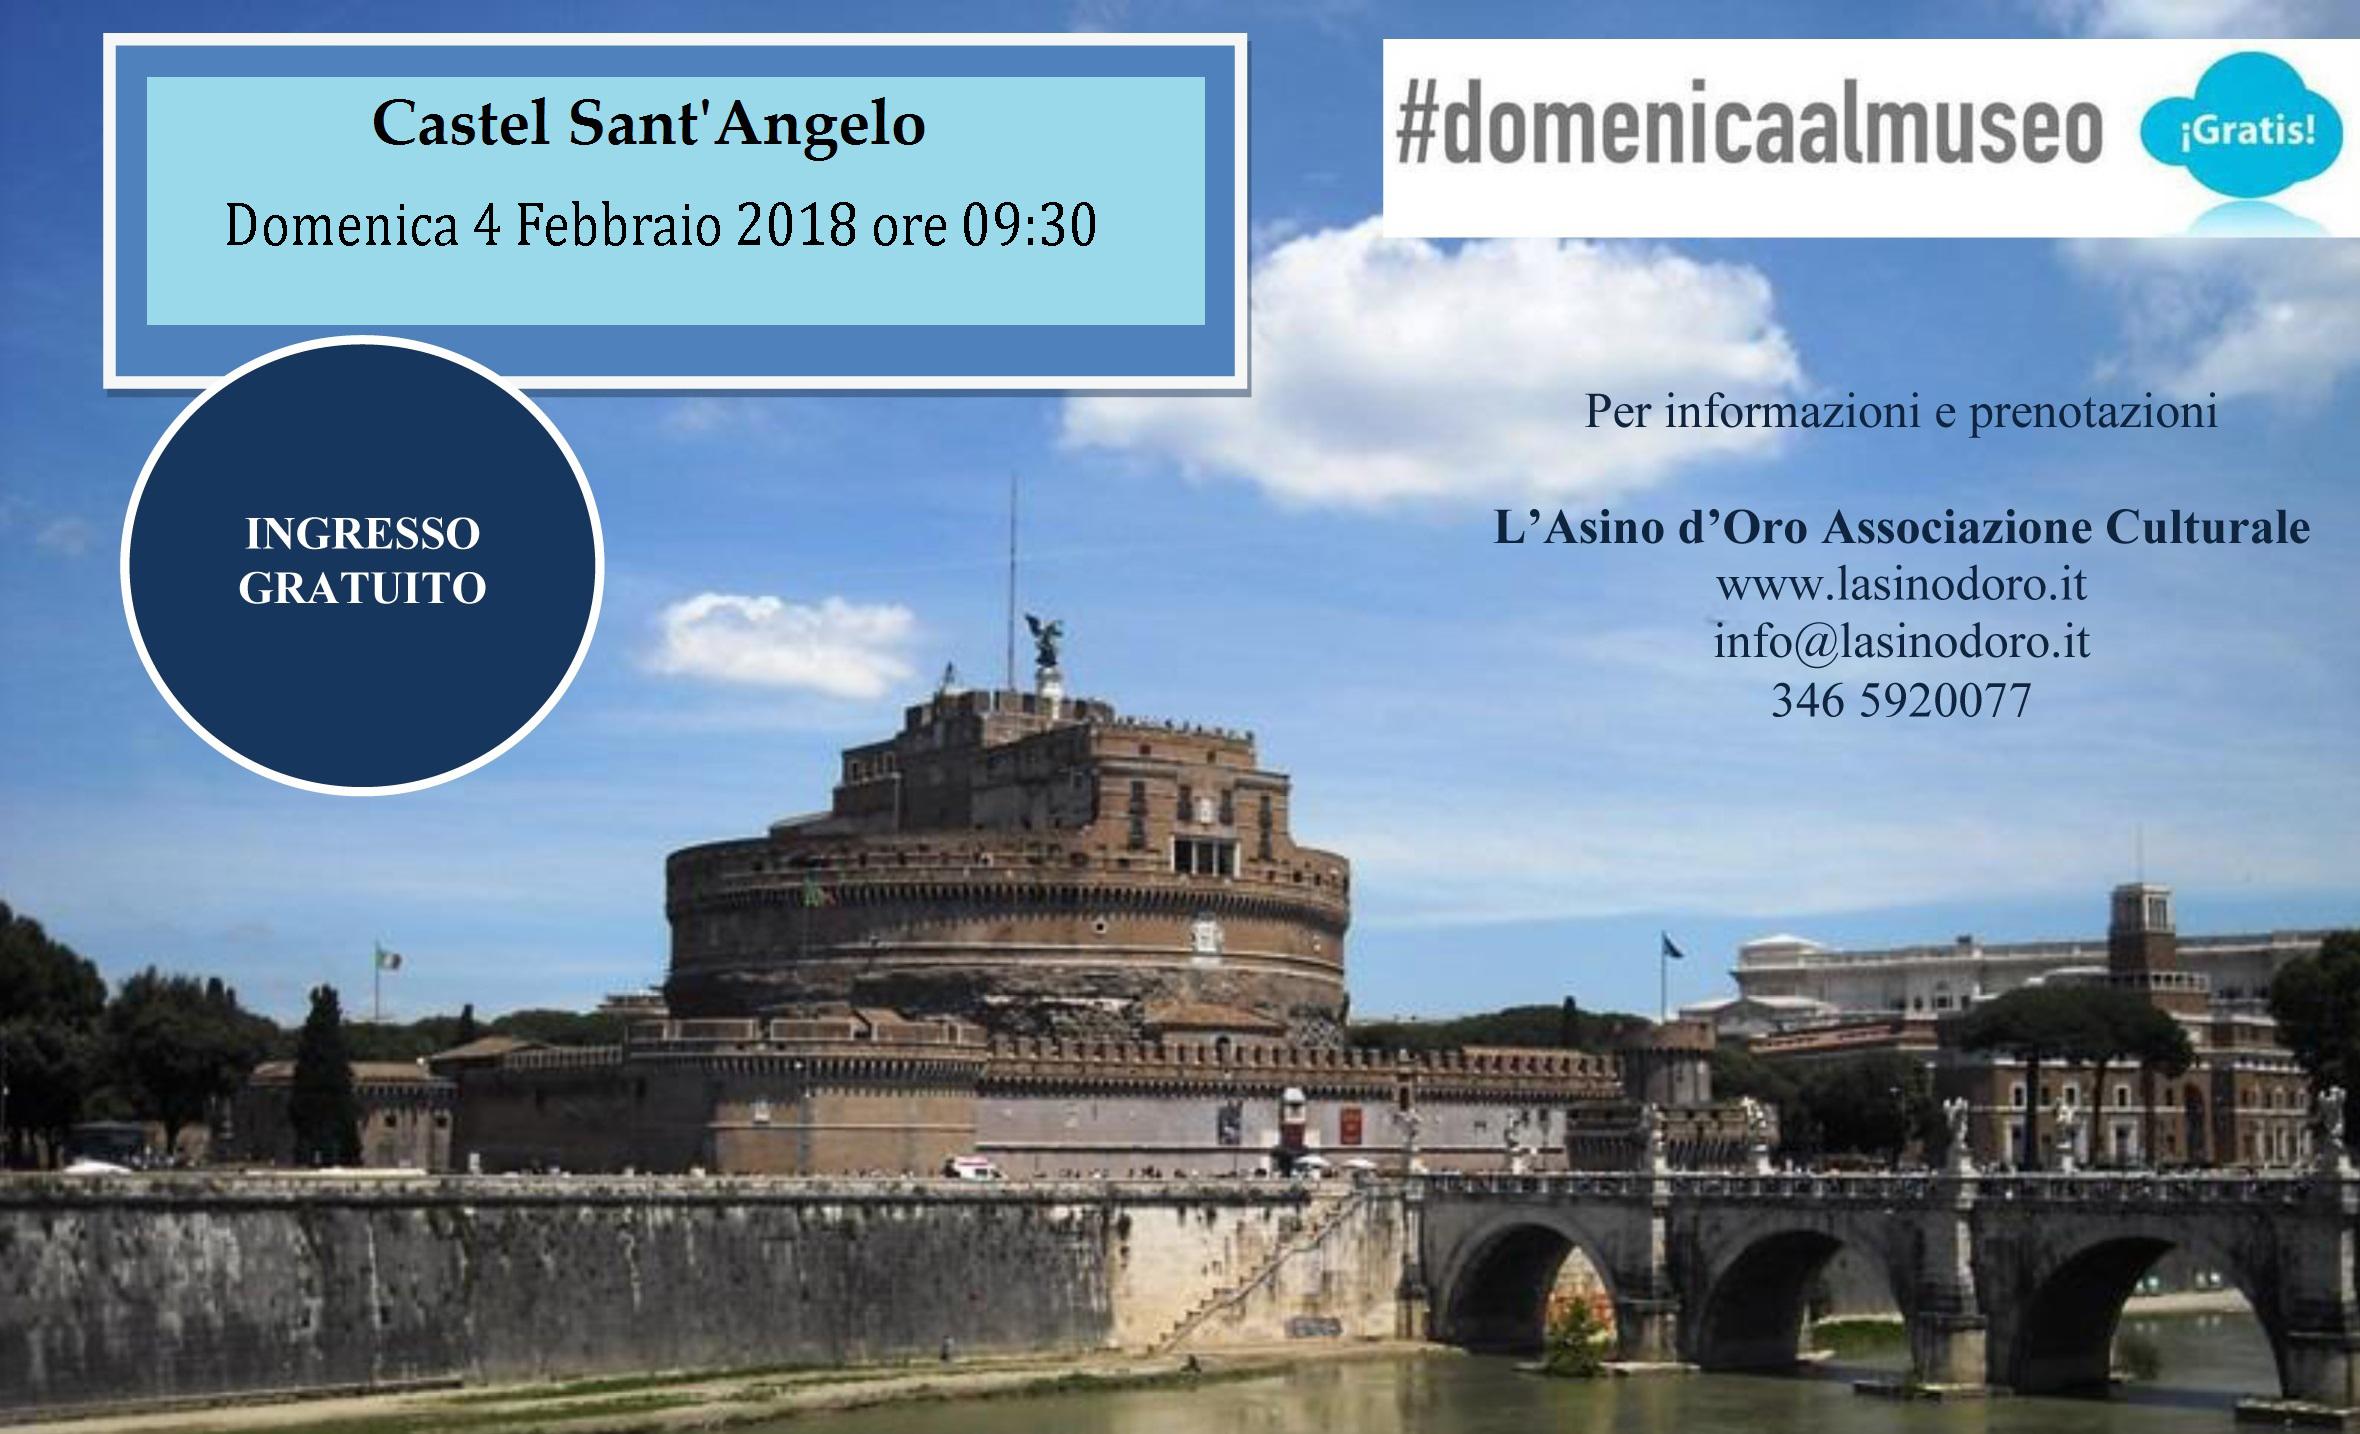 Castel Sant'Angelo: da mausoleo a fortezza